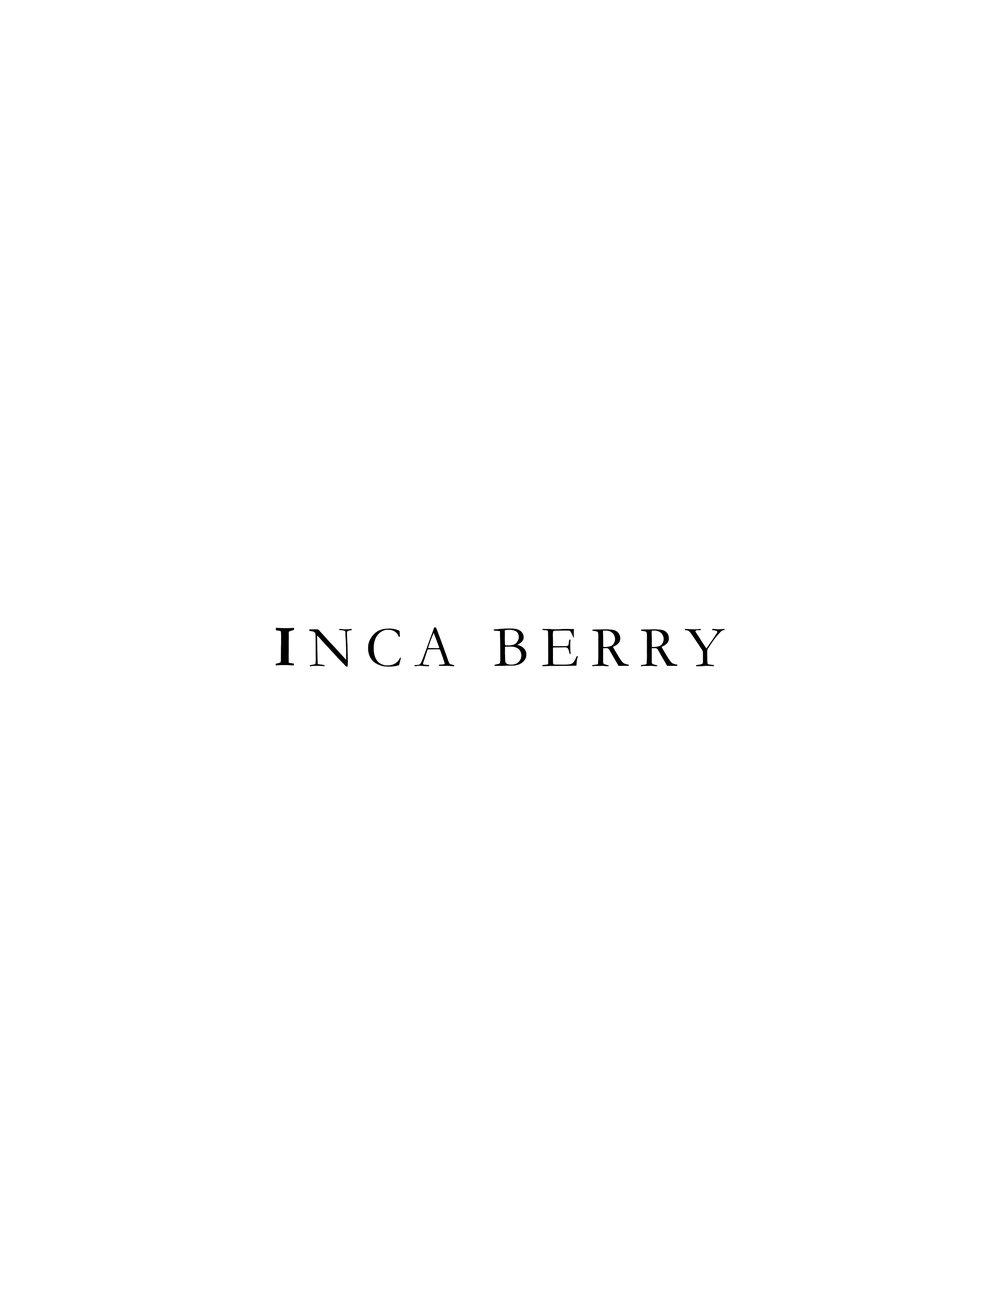 Inca Berry Text.jpg